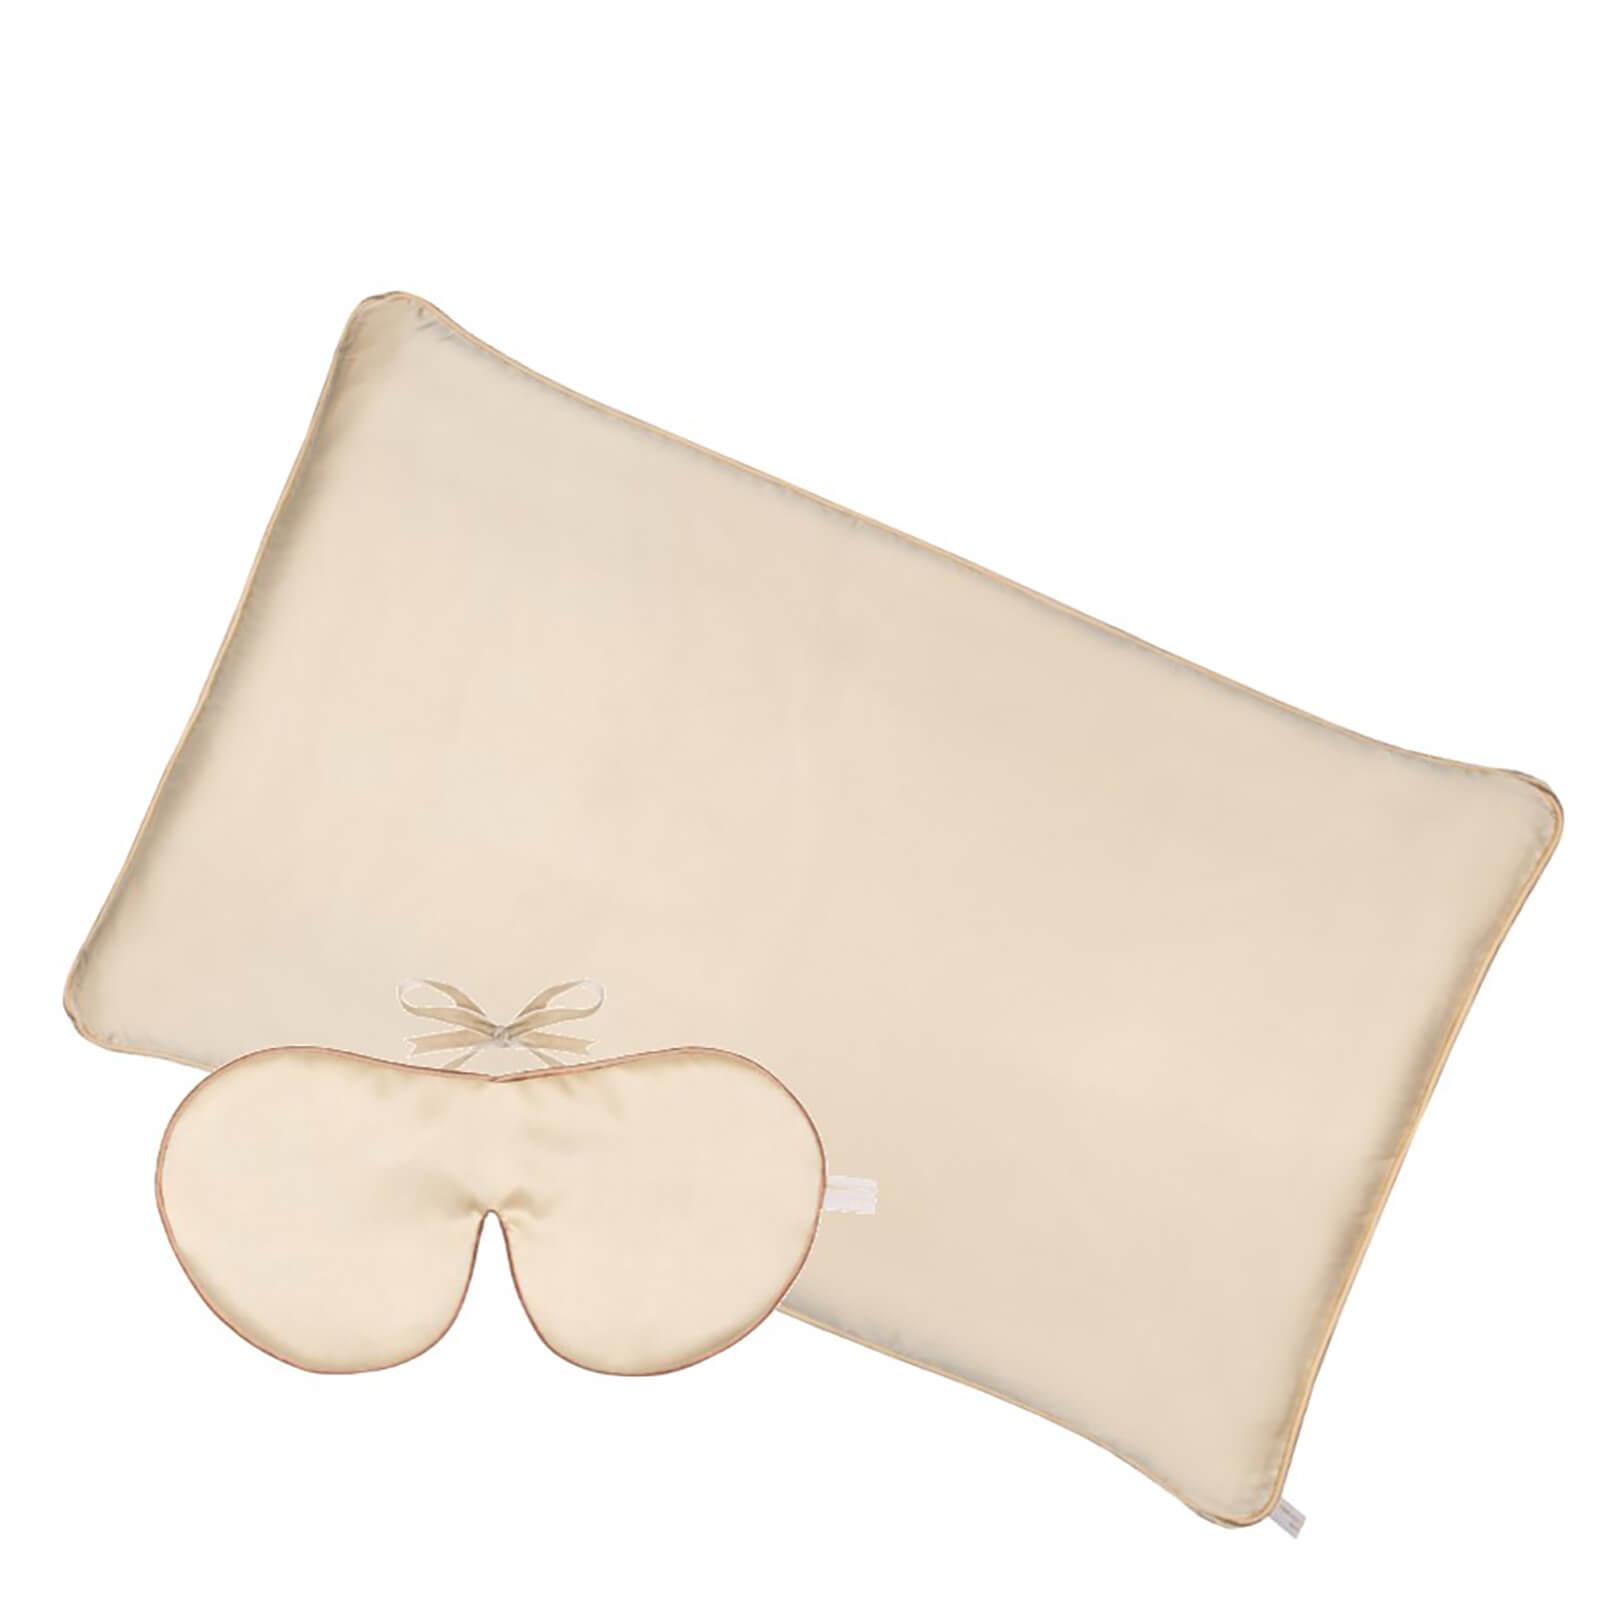 Holistic Silk Anti-Ageing Rejuvenating Sleep Set - Cream (Worth £145.00)